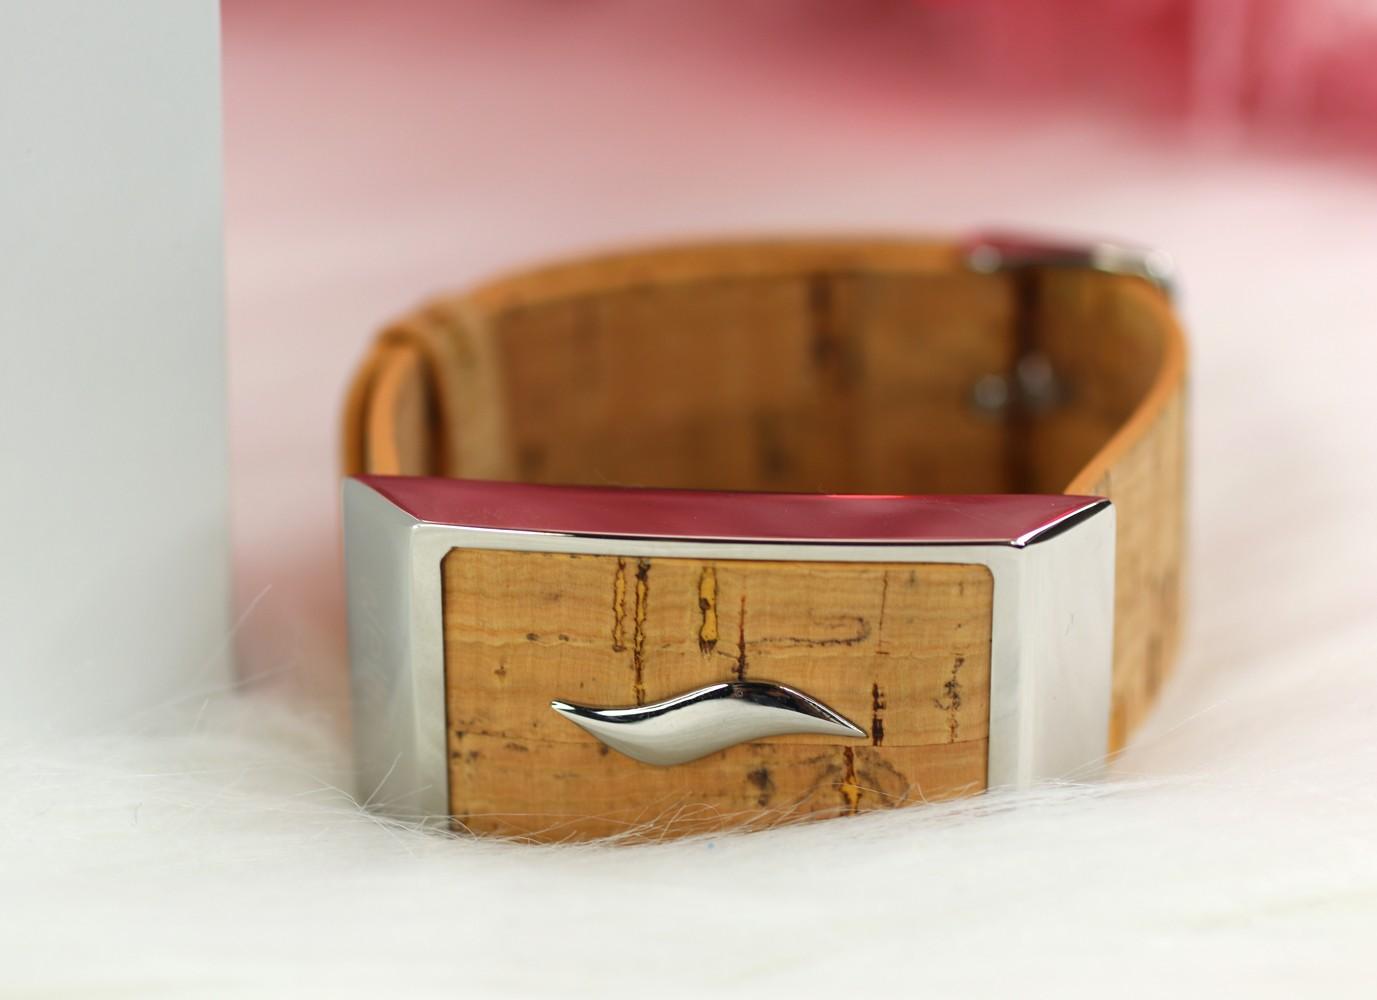 The WellBe Stress Balancing Bracelet